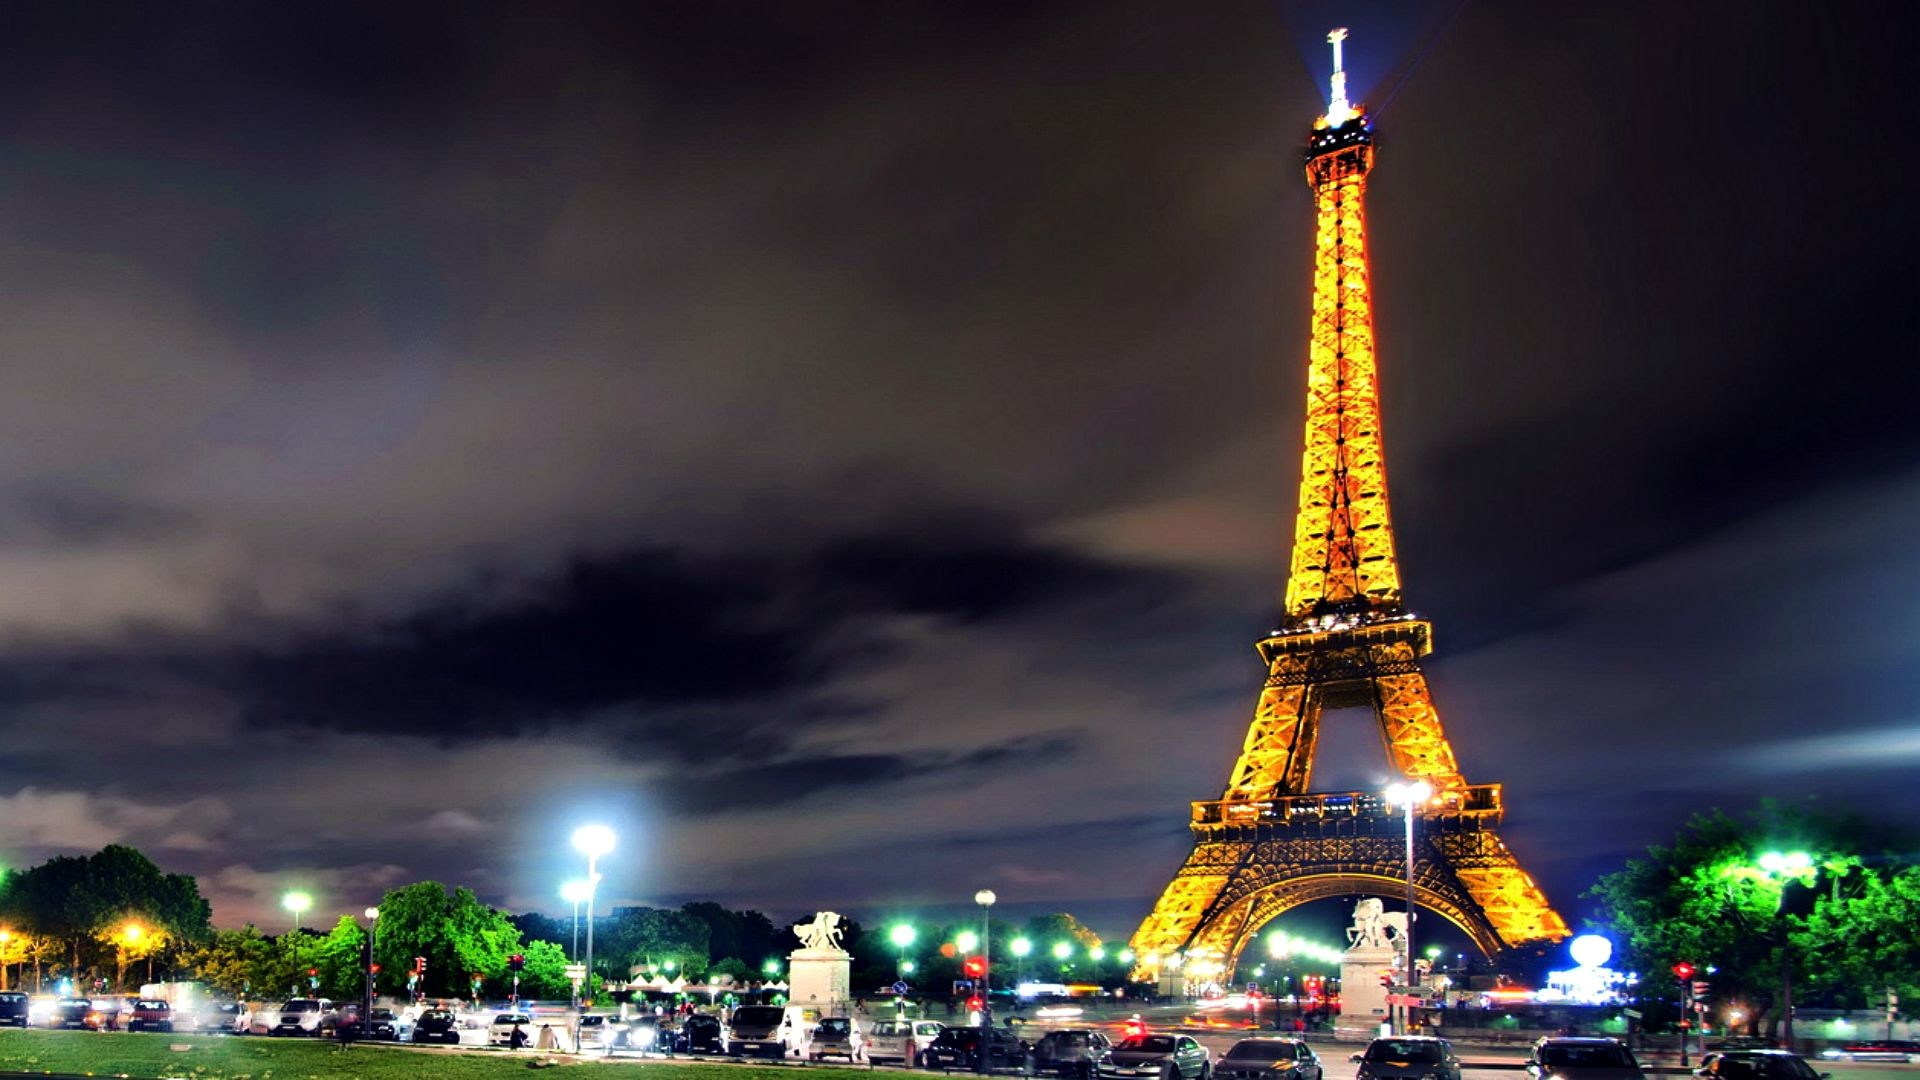 Res: 1920x1080, Eiffel Tower Desktop Wallpapers Wallpaper 1920×1080 Eiffel Tower Pictures  Wallpapers (44 Wallpapers)   Adorable Wallpapers